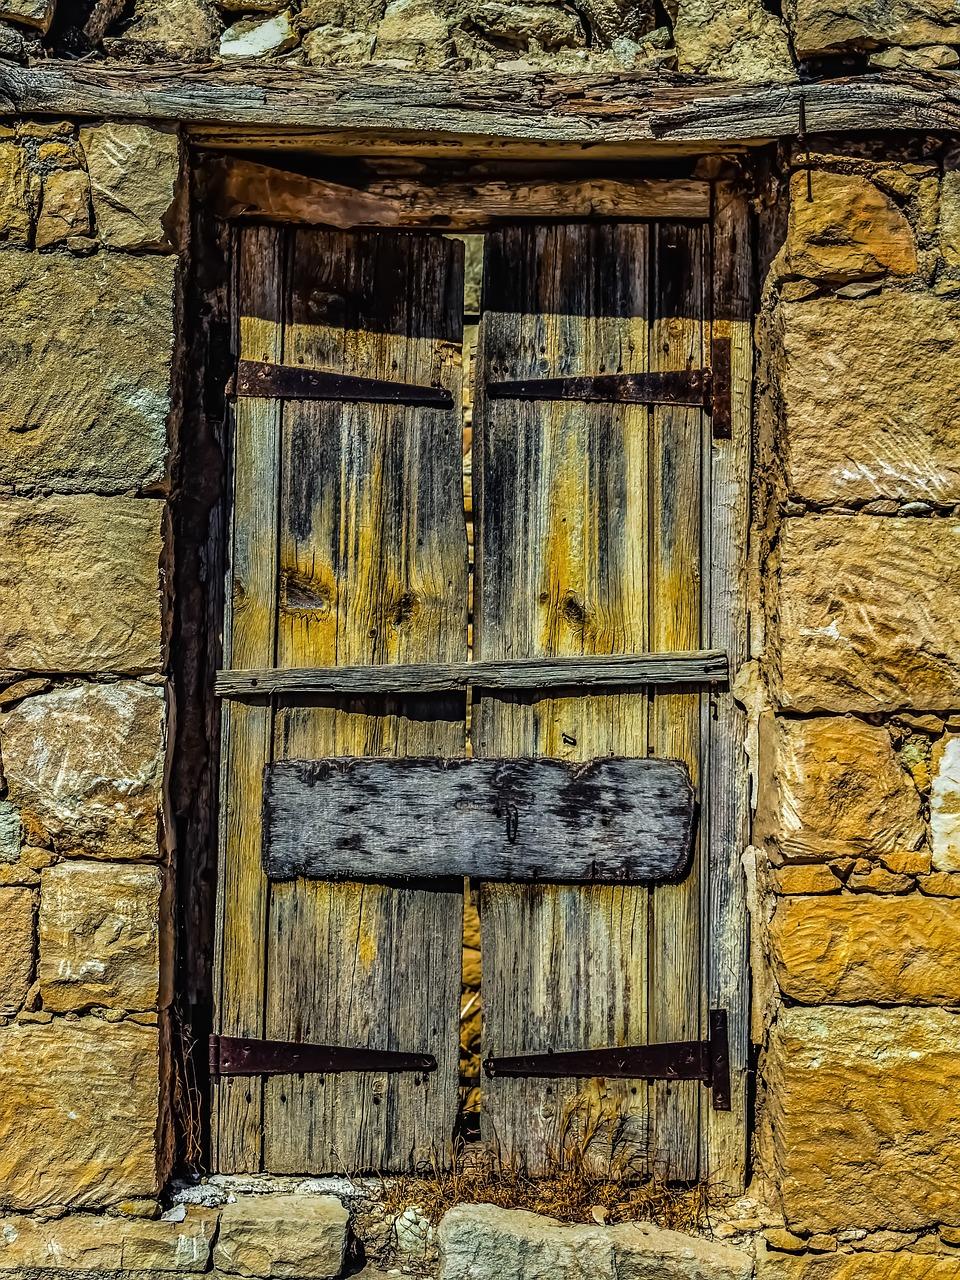 фото заколоченная дверь мешает вам